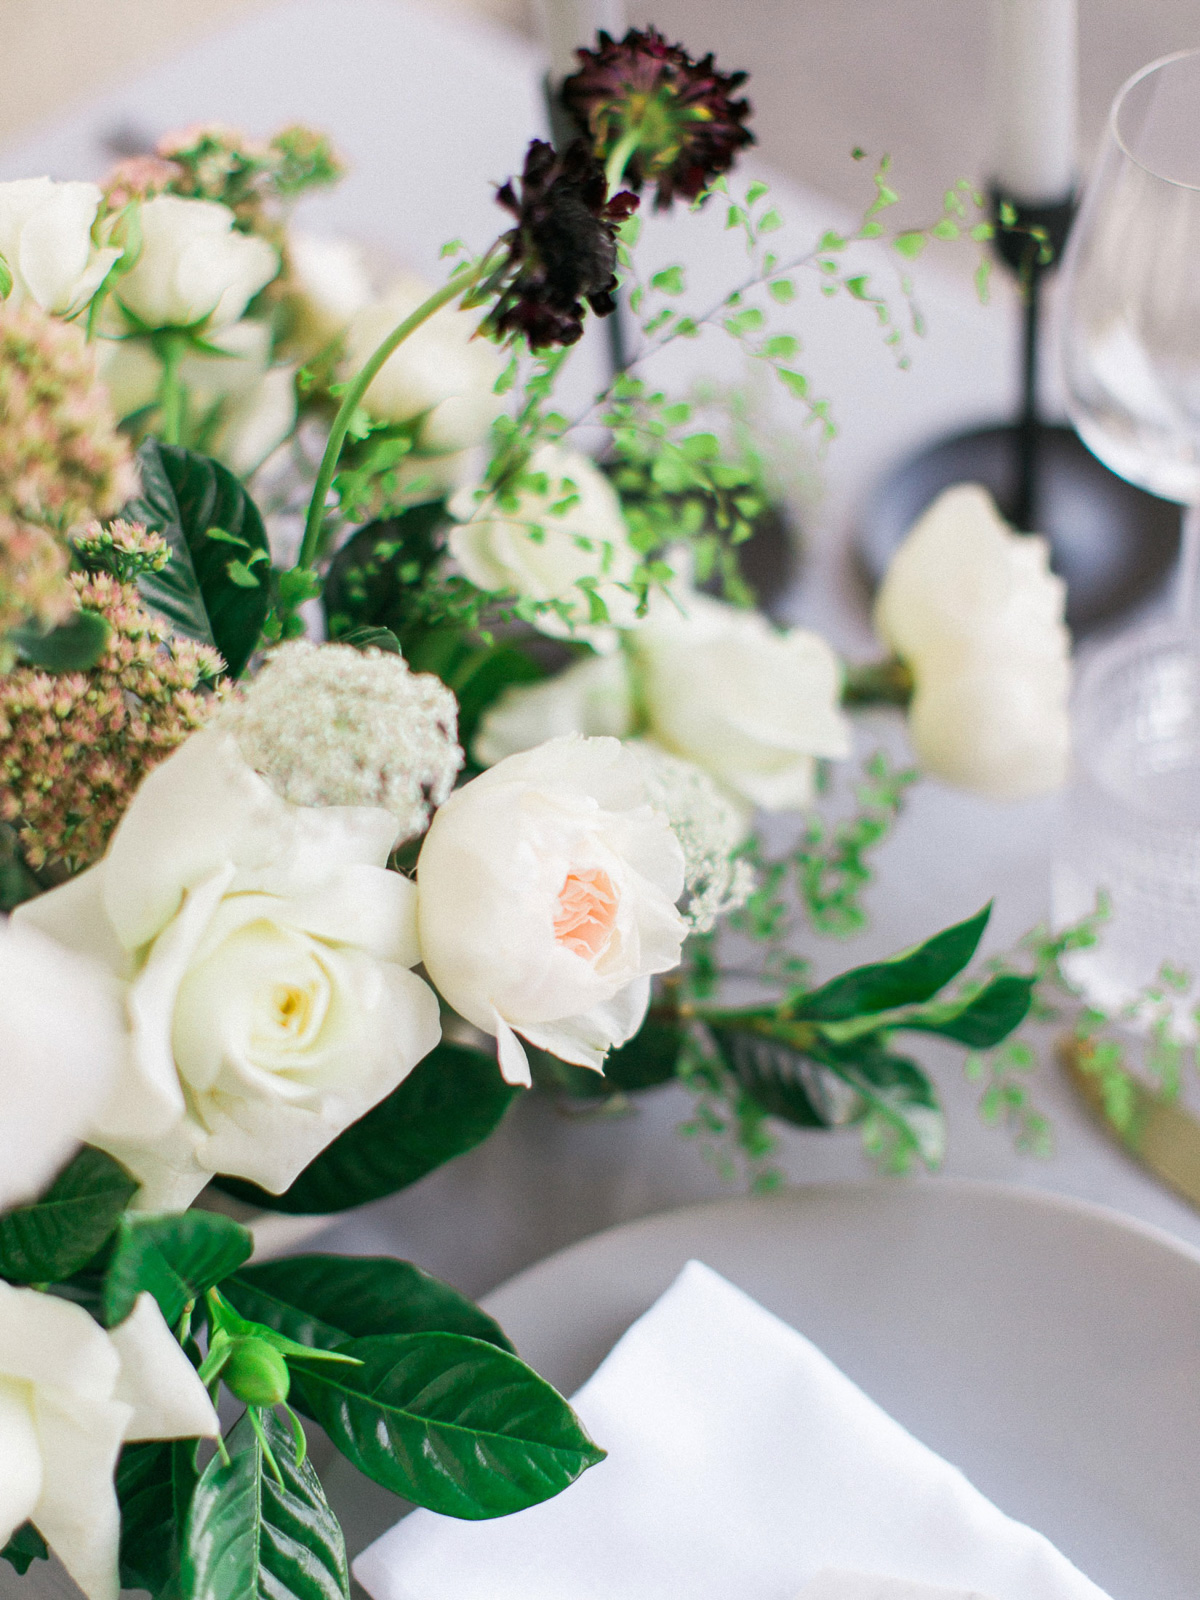 kurtz-orpia-photography-vineyard-bride-swish-list-dundurn-castle-dundas-wedding-editorial-37.jpg